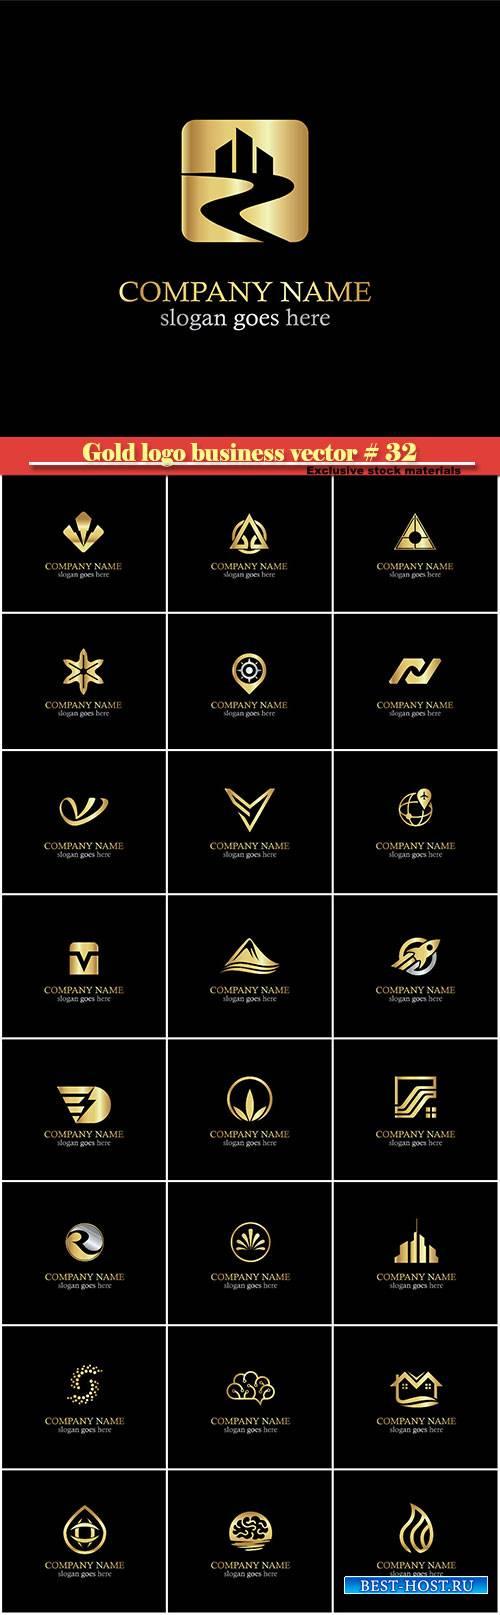 Gold logo business vector illustration # 32